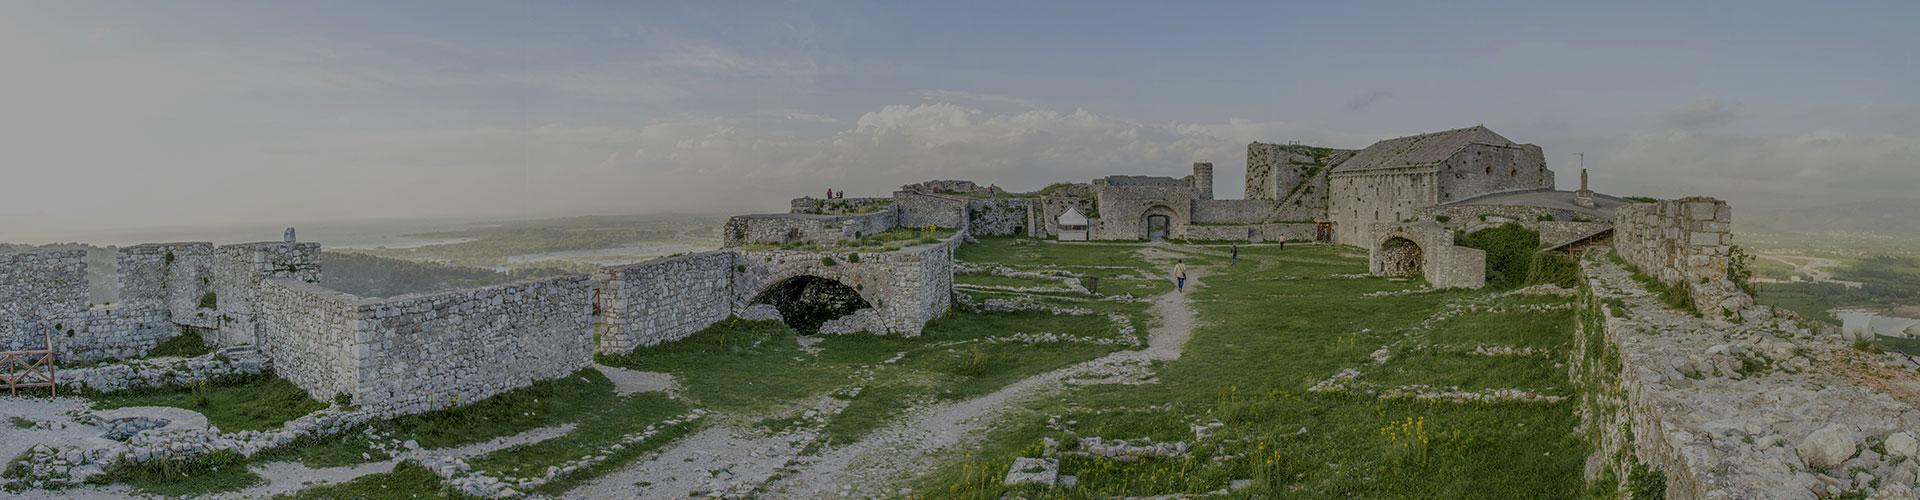 Landmark photograph of Albania